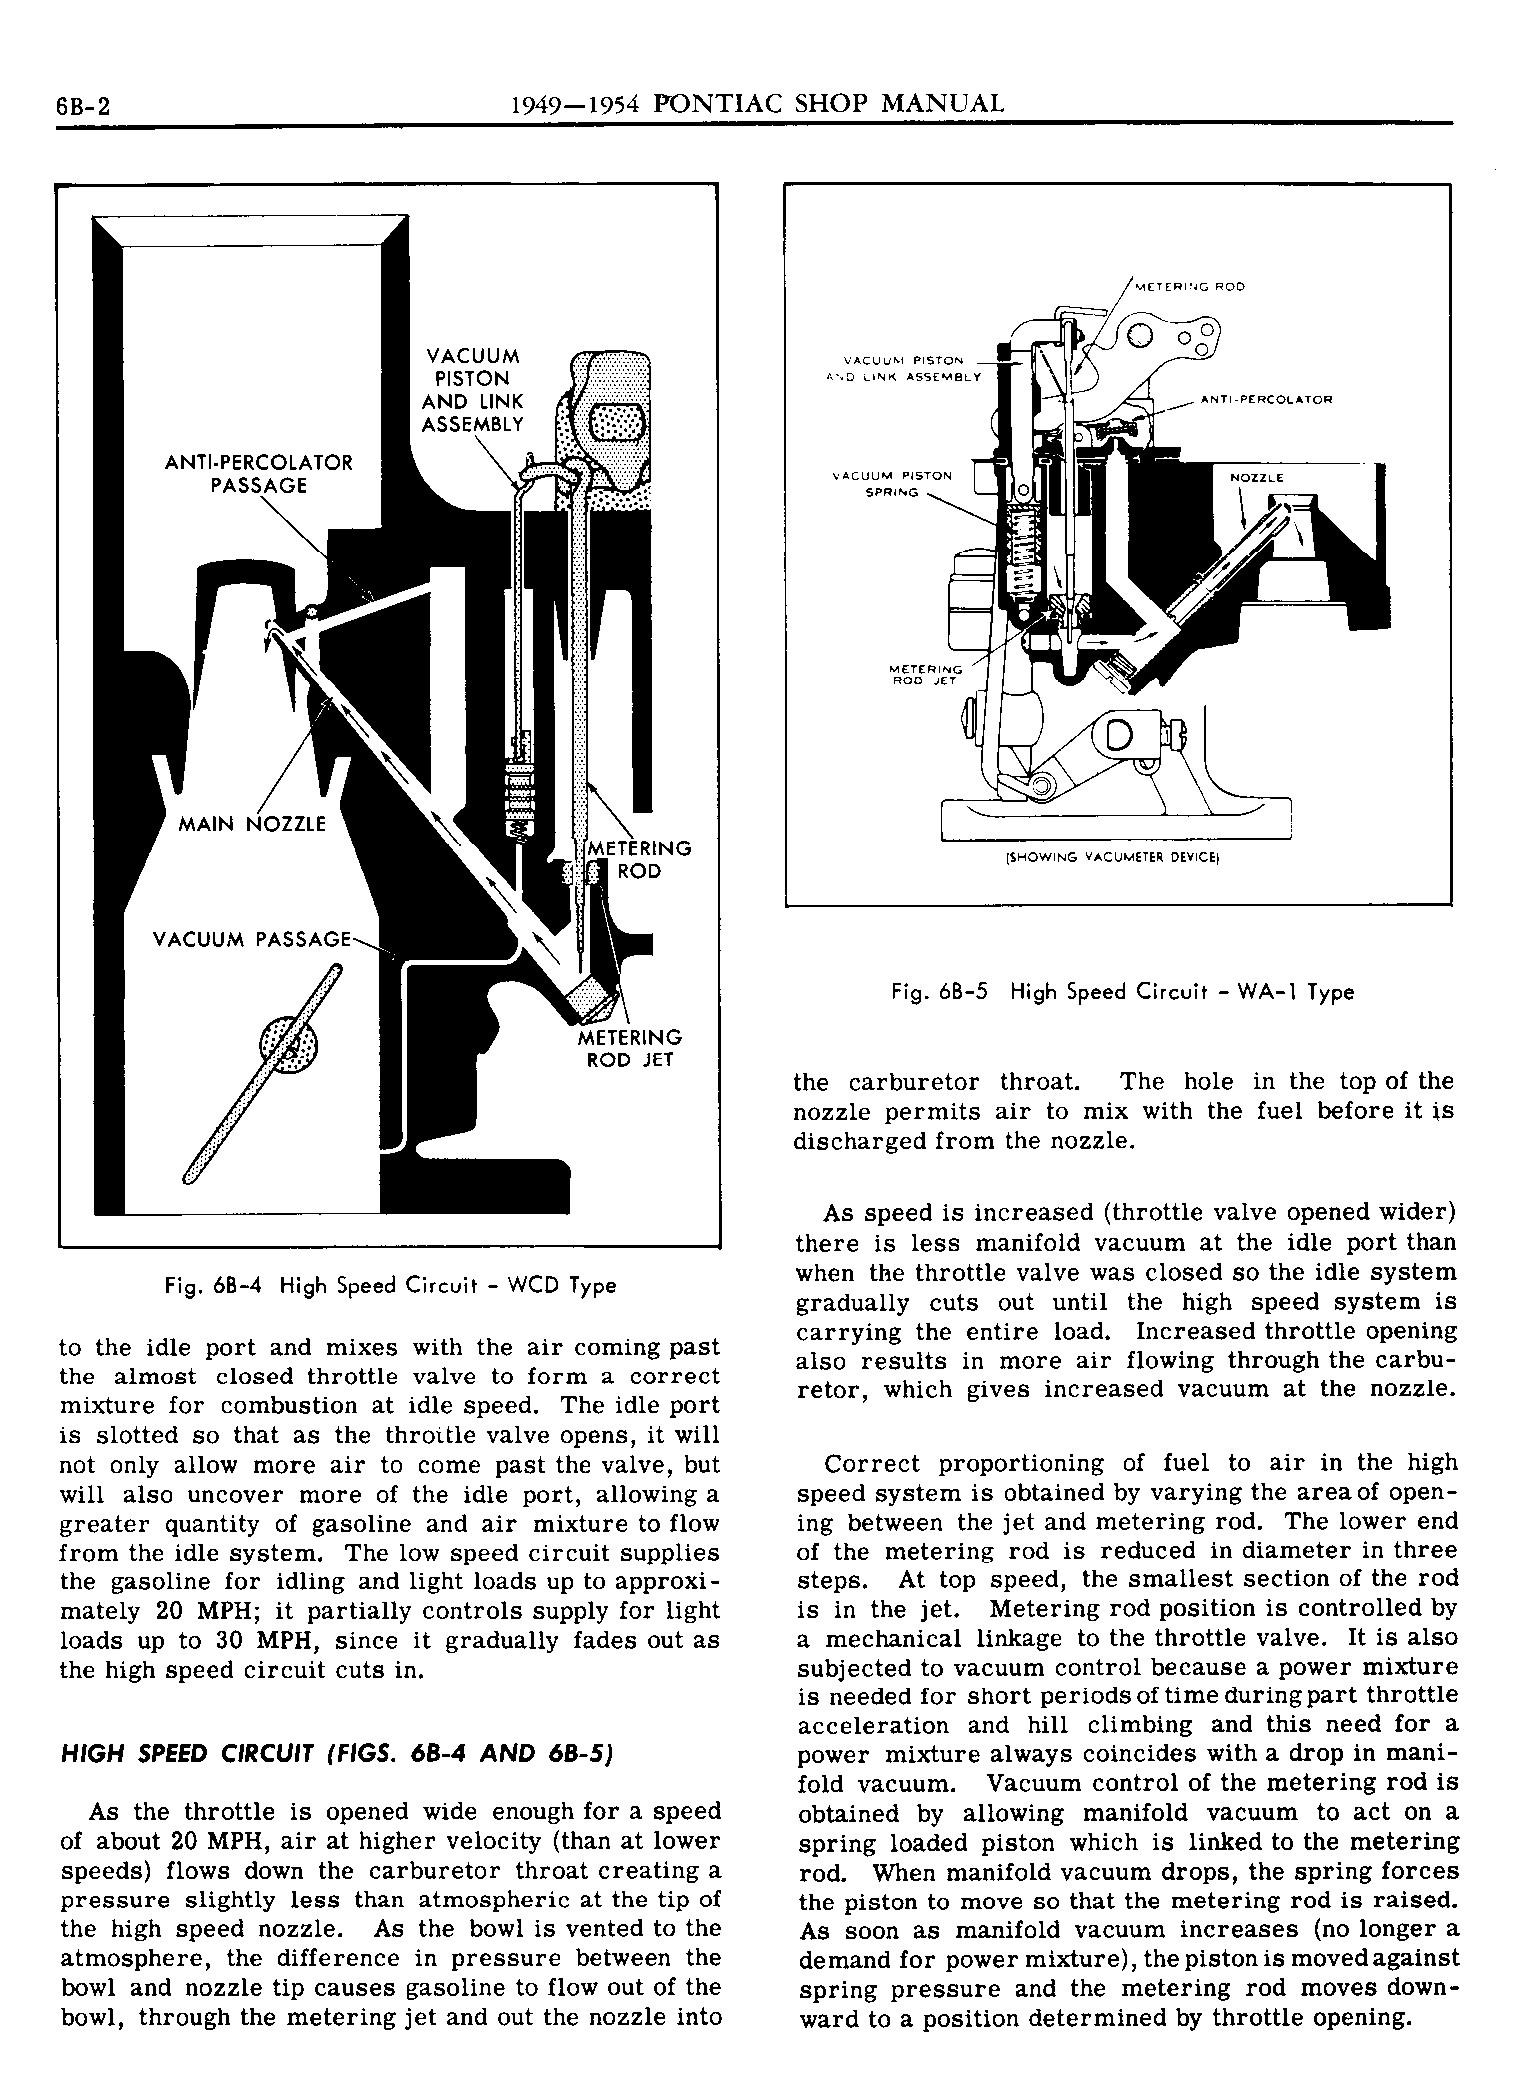 1949 Pontiac Shop Manual- Engine Fuel Page 2 of 42